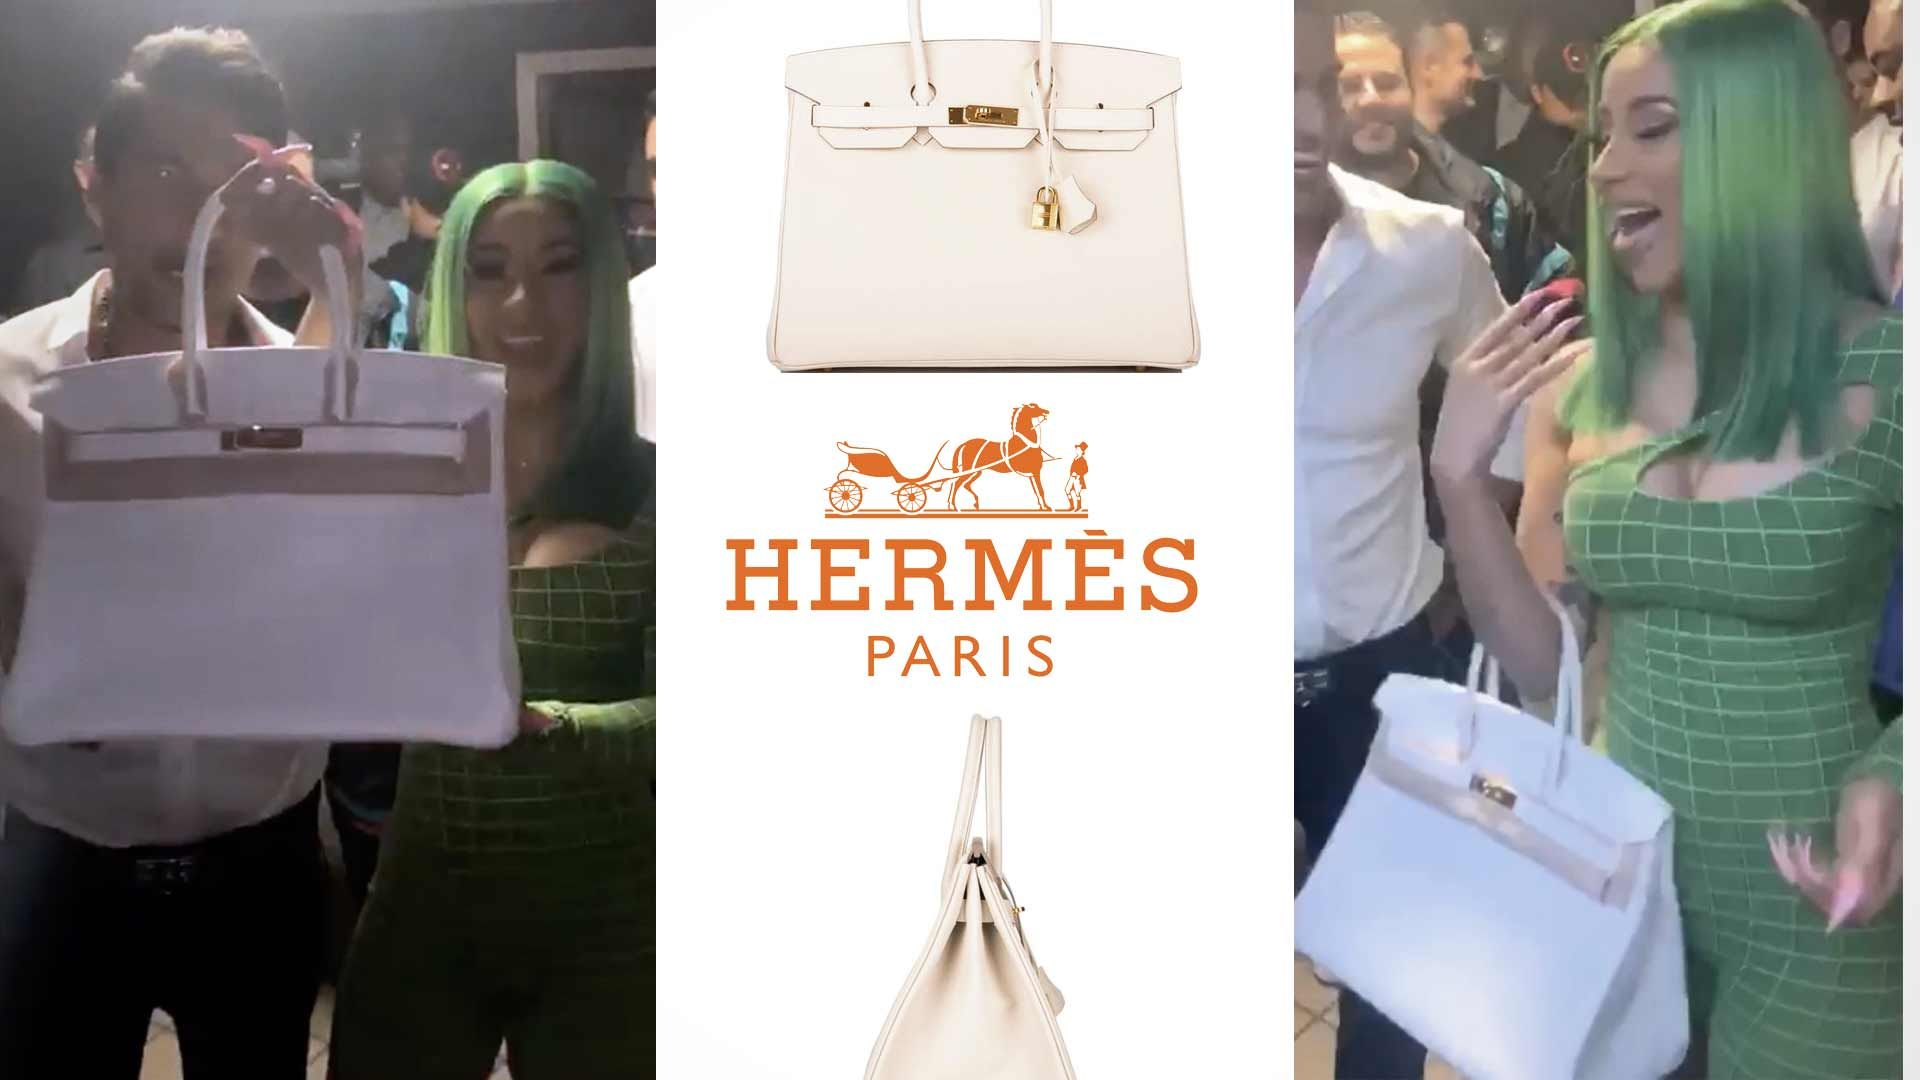 Cardi B Super Fan Gifts Singer 20k Birkin Bag For Showing Up To